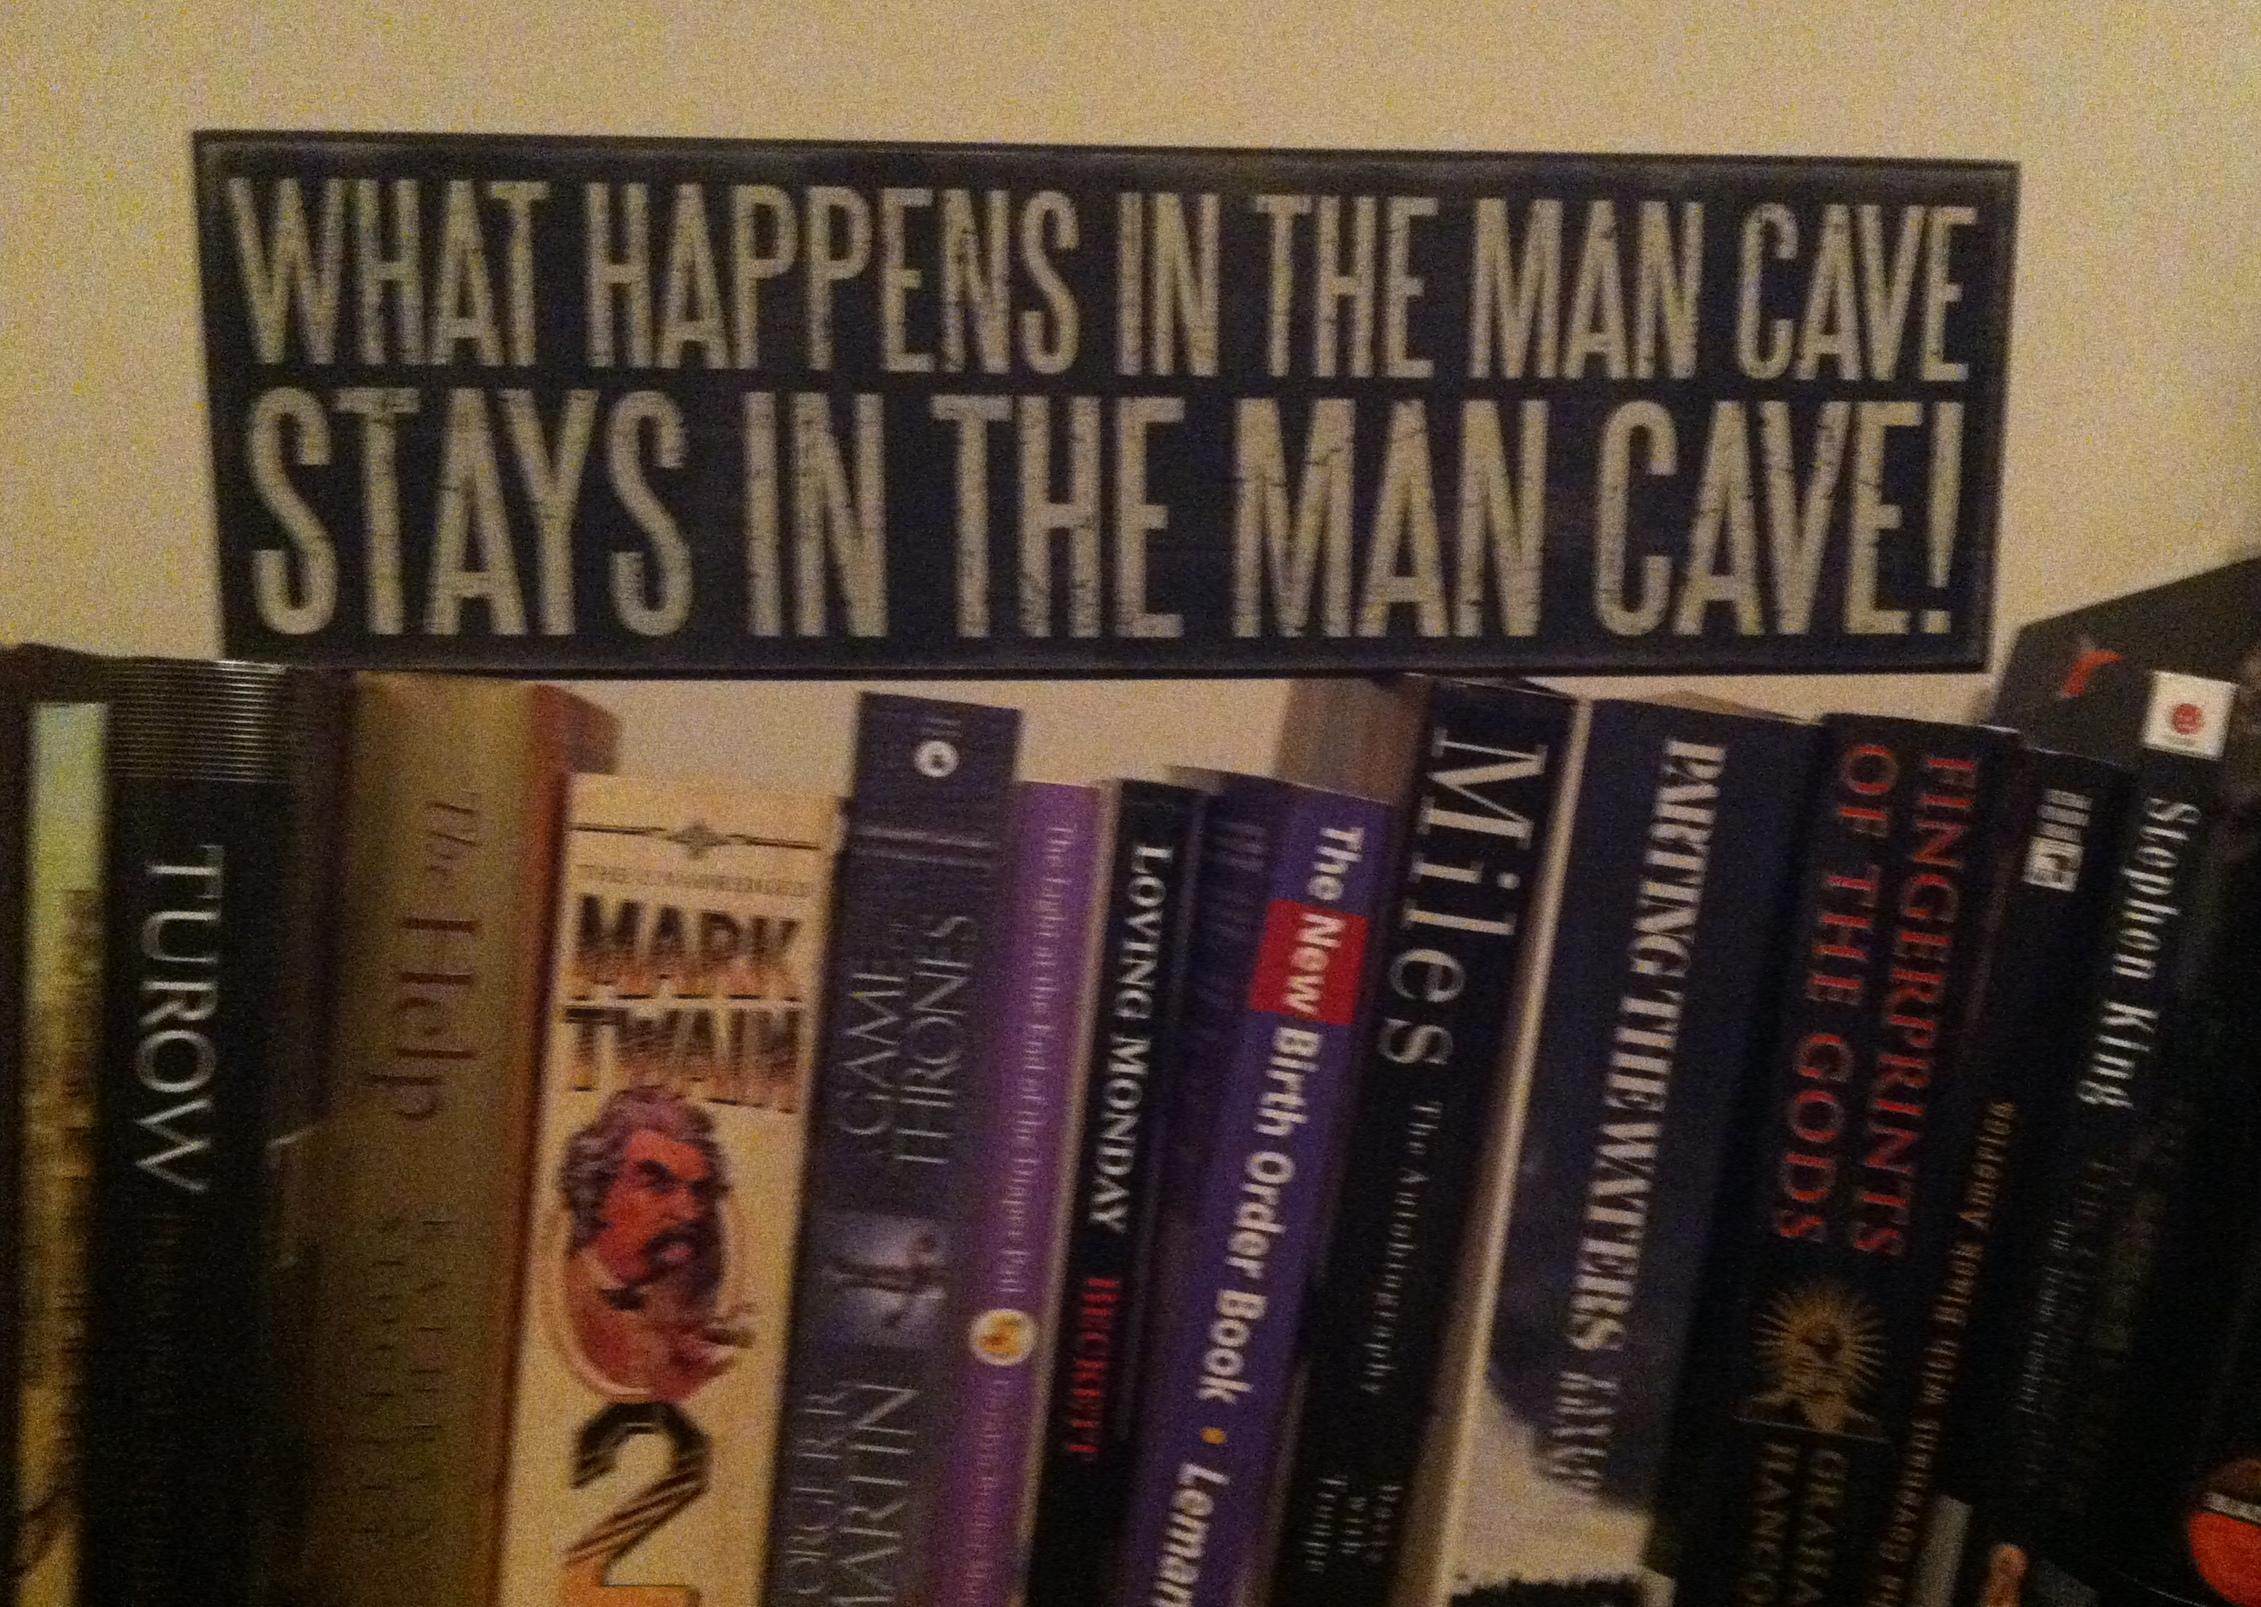 A Manumental Man Cave Manifesto